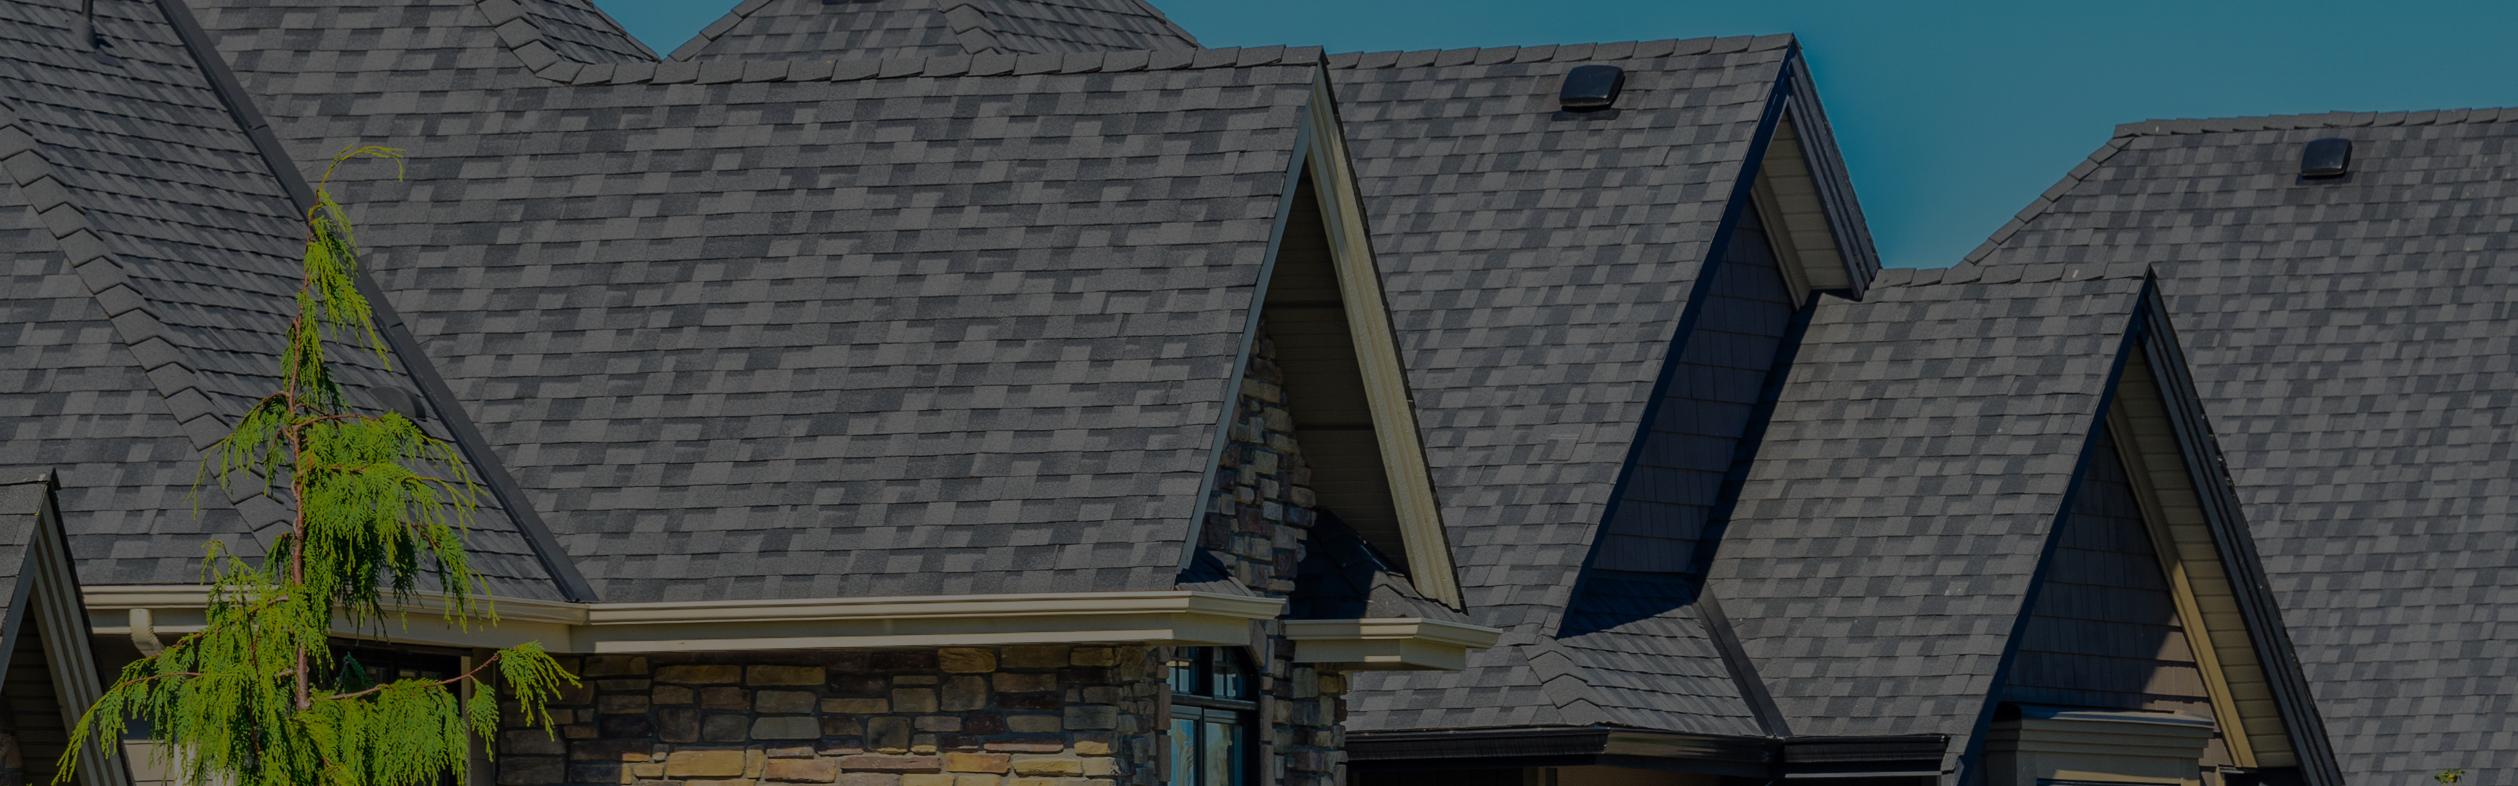 Reparation toiture levis